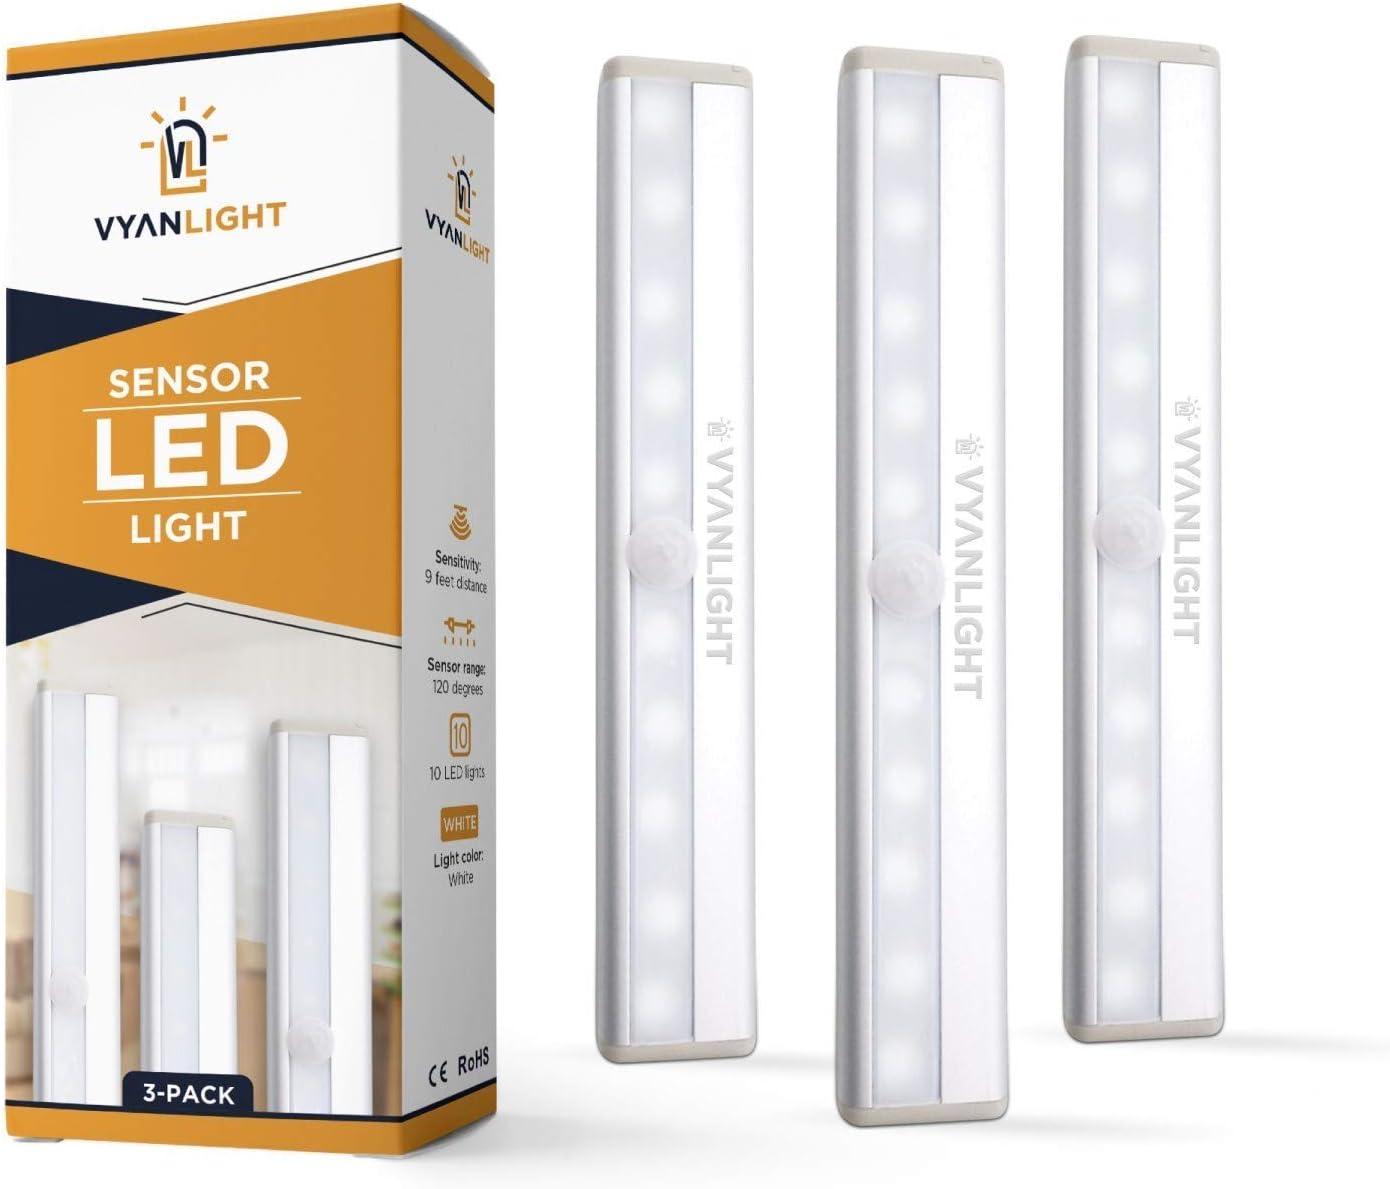 Best Budget Motion Sensor Led Bar: Vyanlight [10 LED] AAA Battery Operated